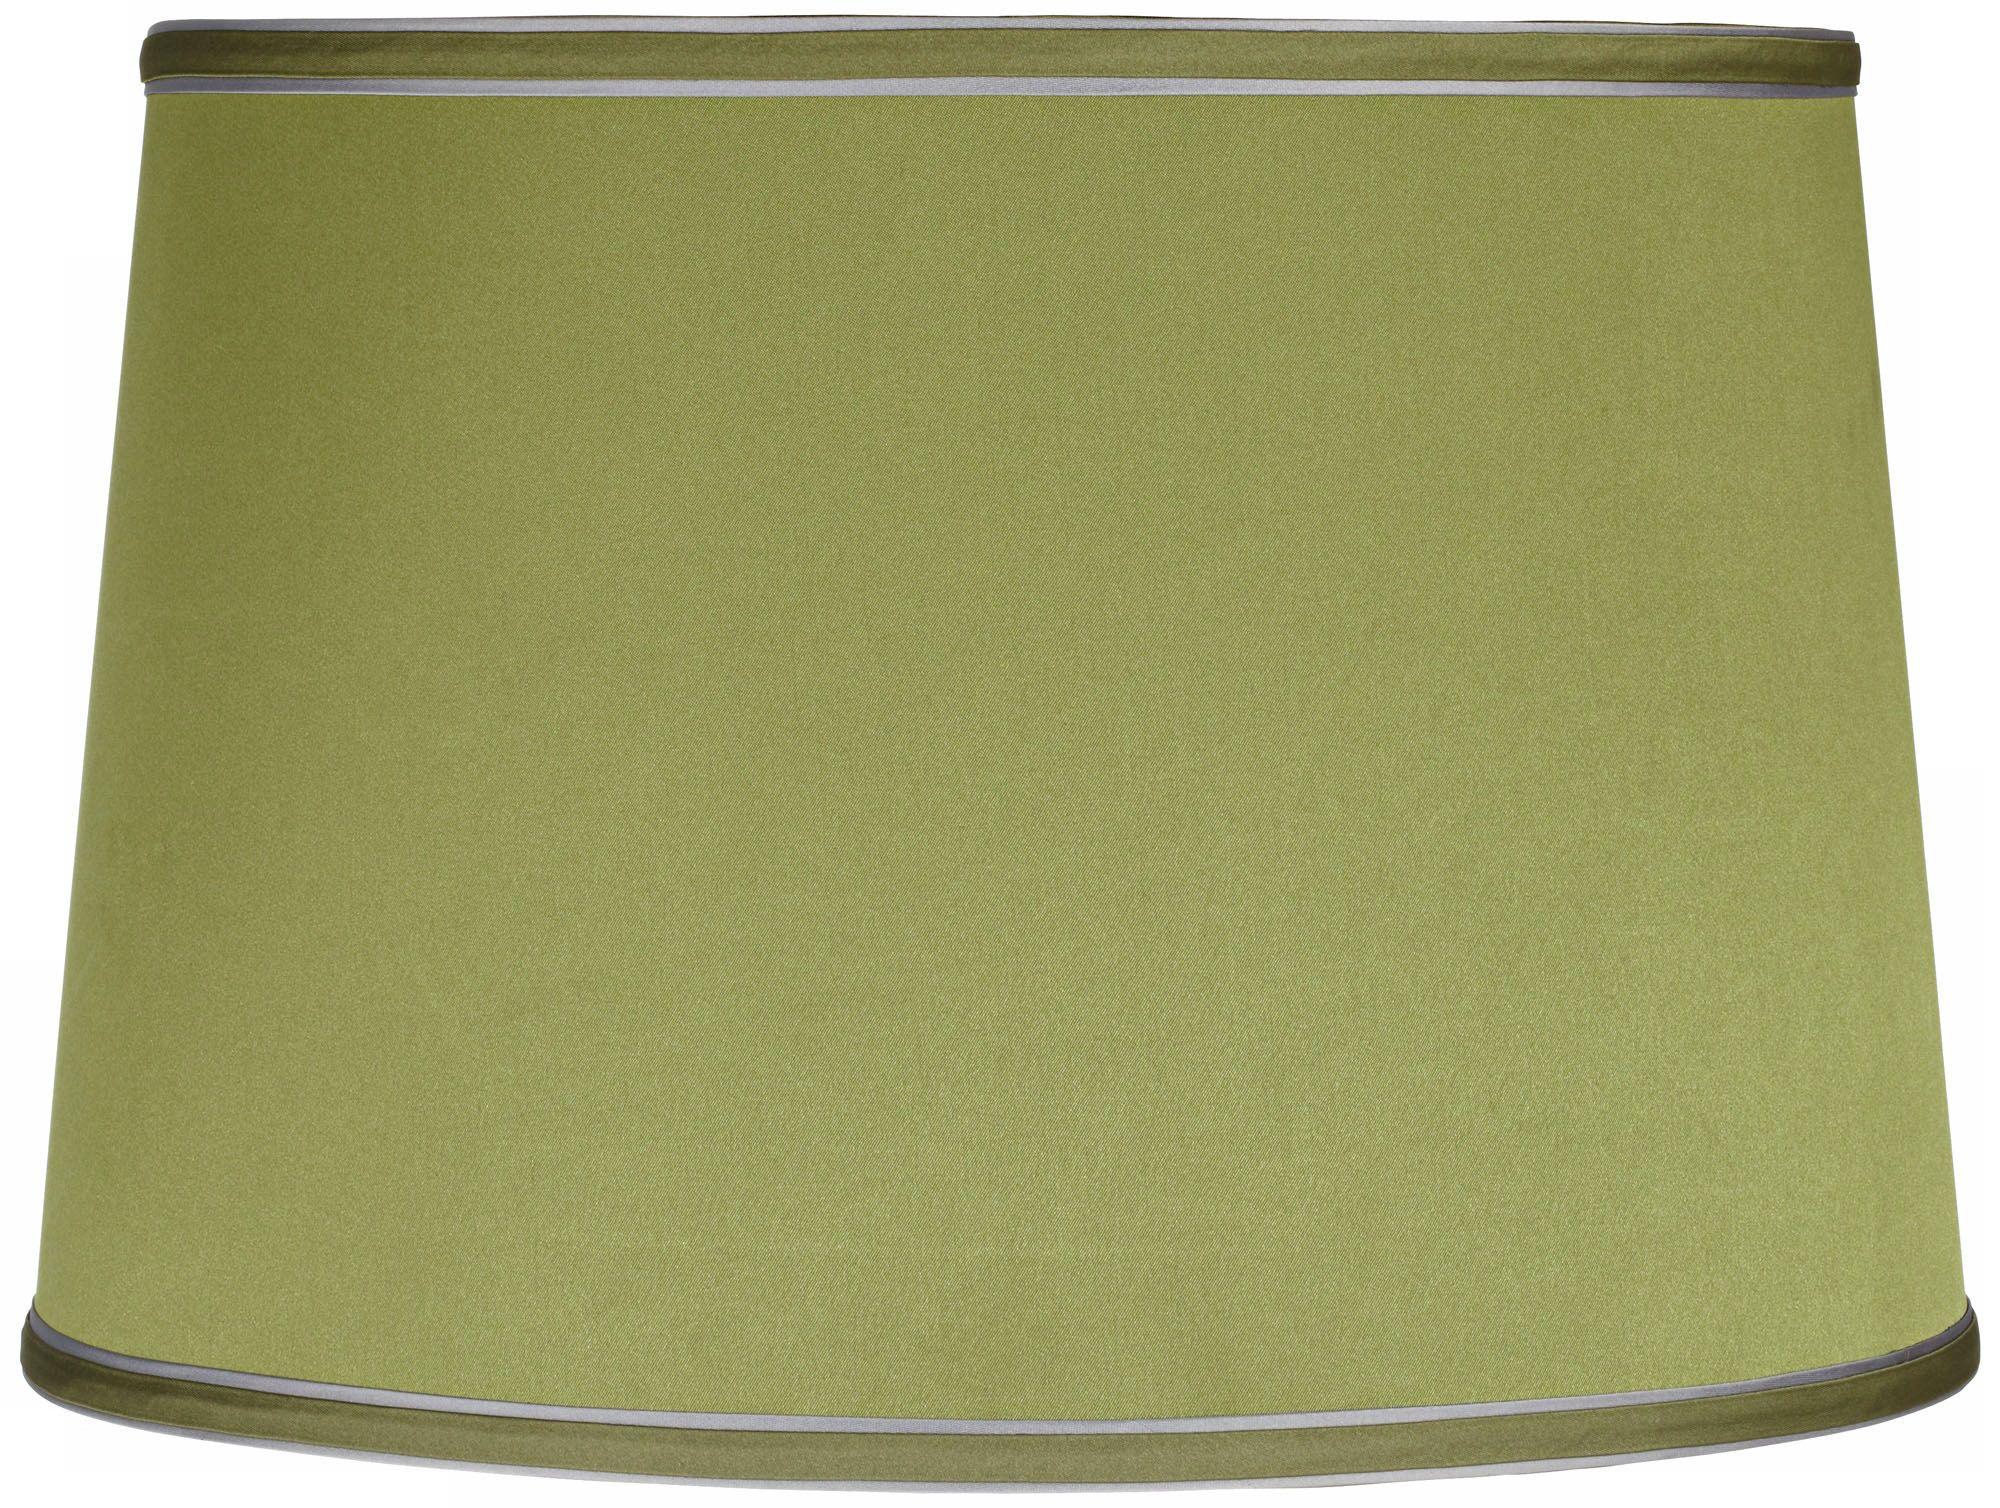 Charming Sydnee Satin Olive Green Drum Lamp Shade 14x16x11 (Spider)